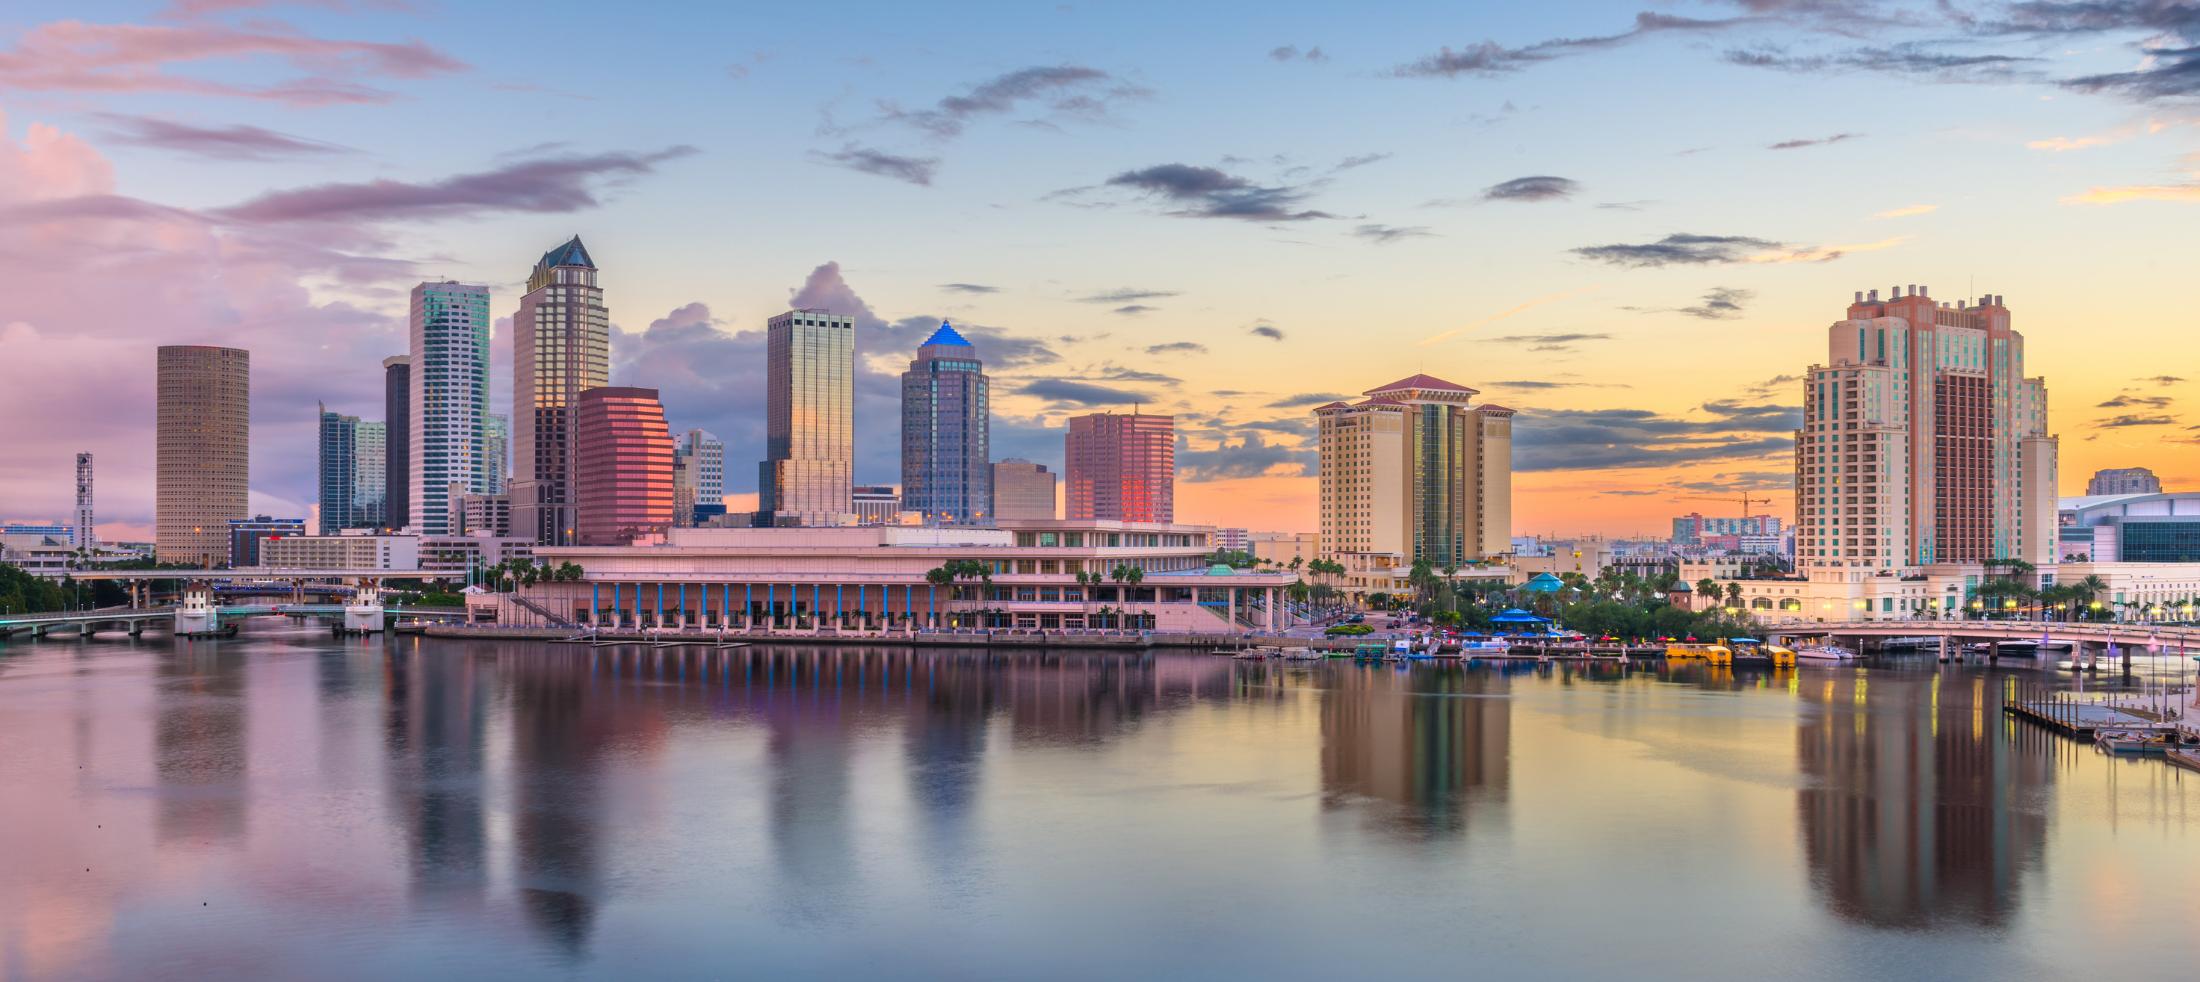 Lyracore Health Alliance in Tampa, FL